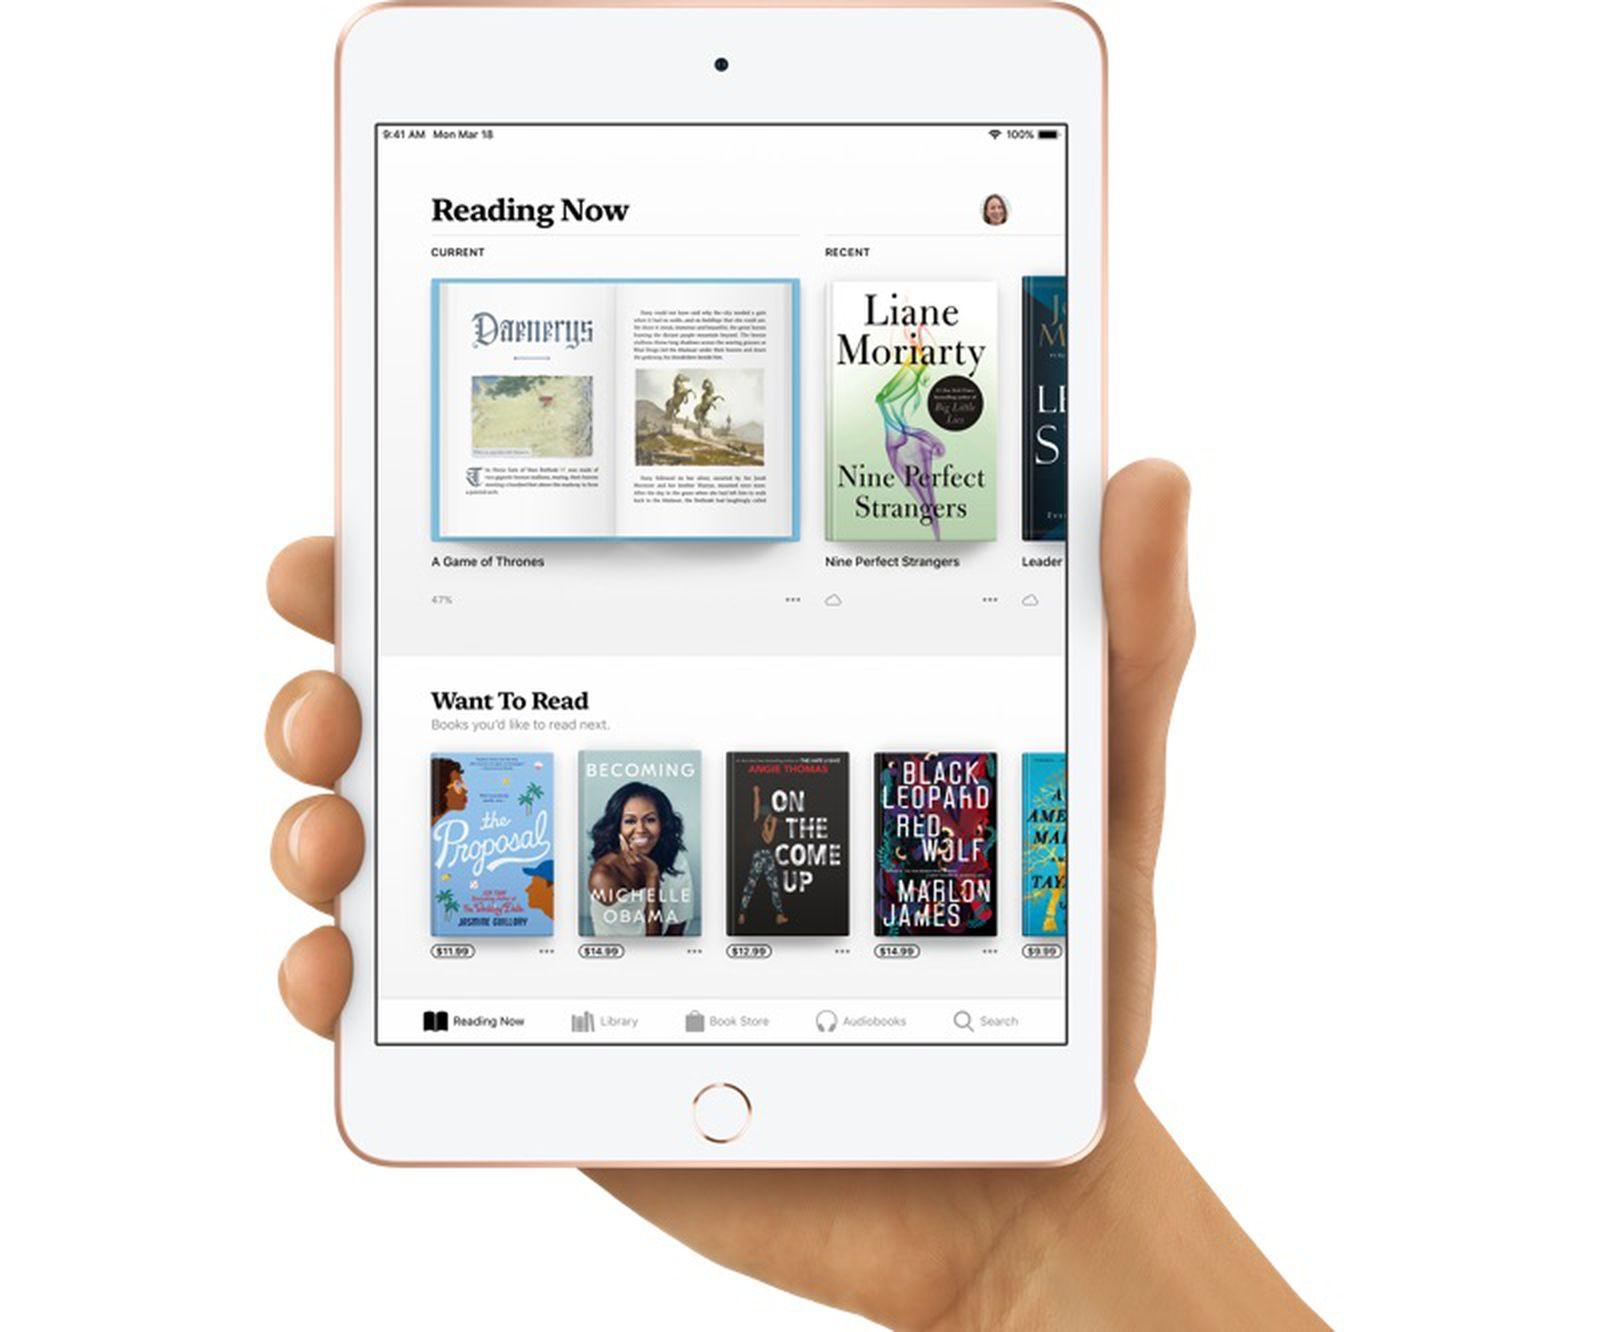 Sketchy Rumor Claims 'iPad Mini Pro' Launching in Second Half of 2021 - MacRumors